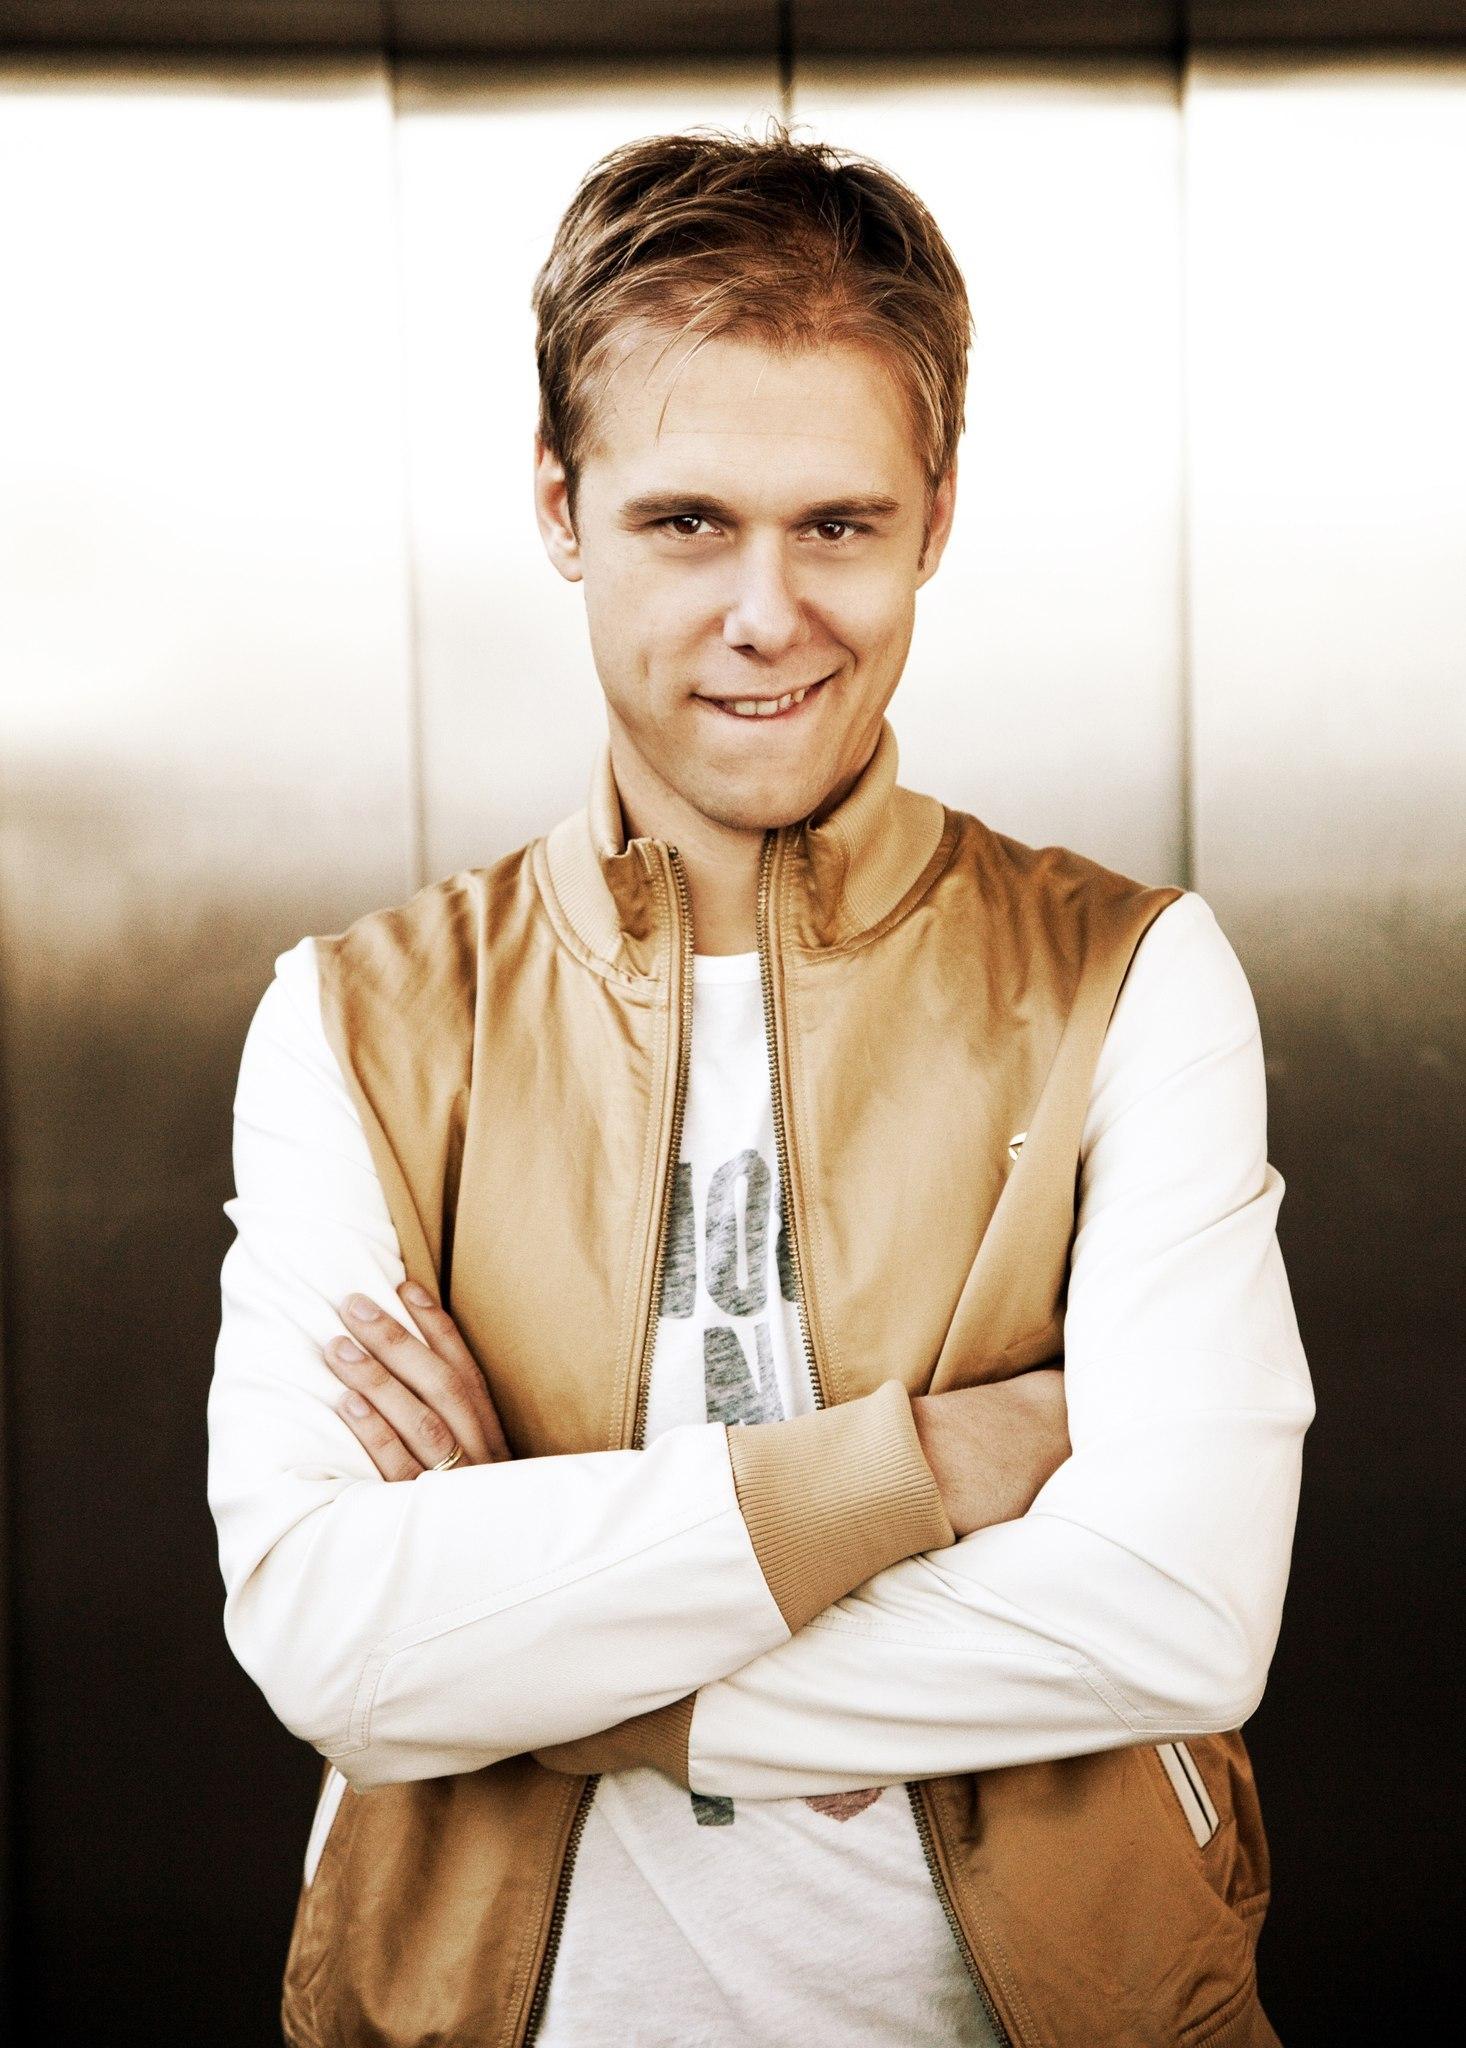 Beliebte Armin Van Buuren Bilder für Mobiltelefone